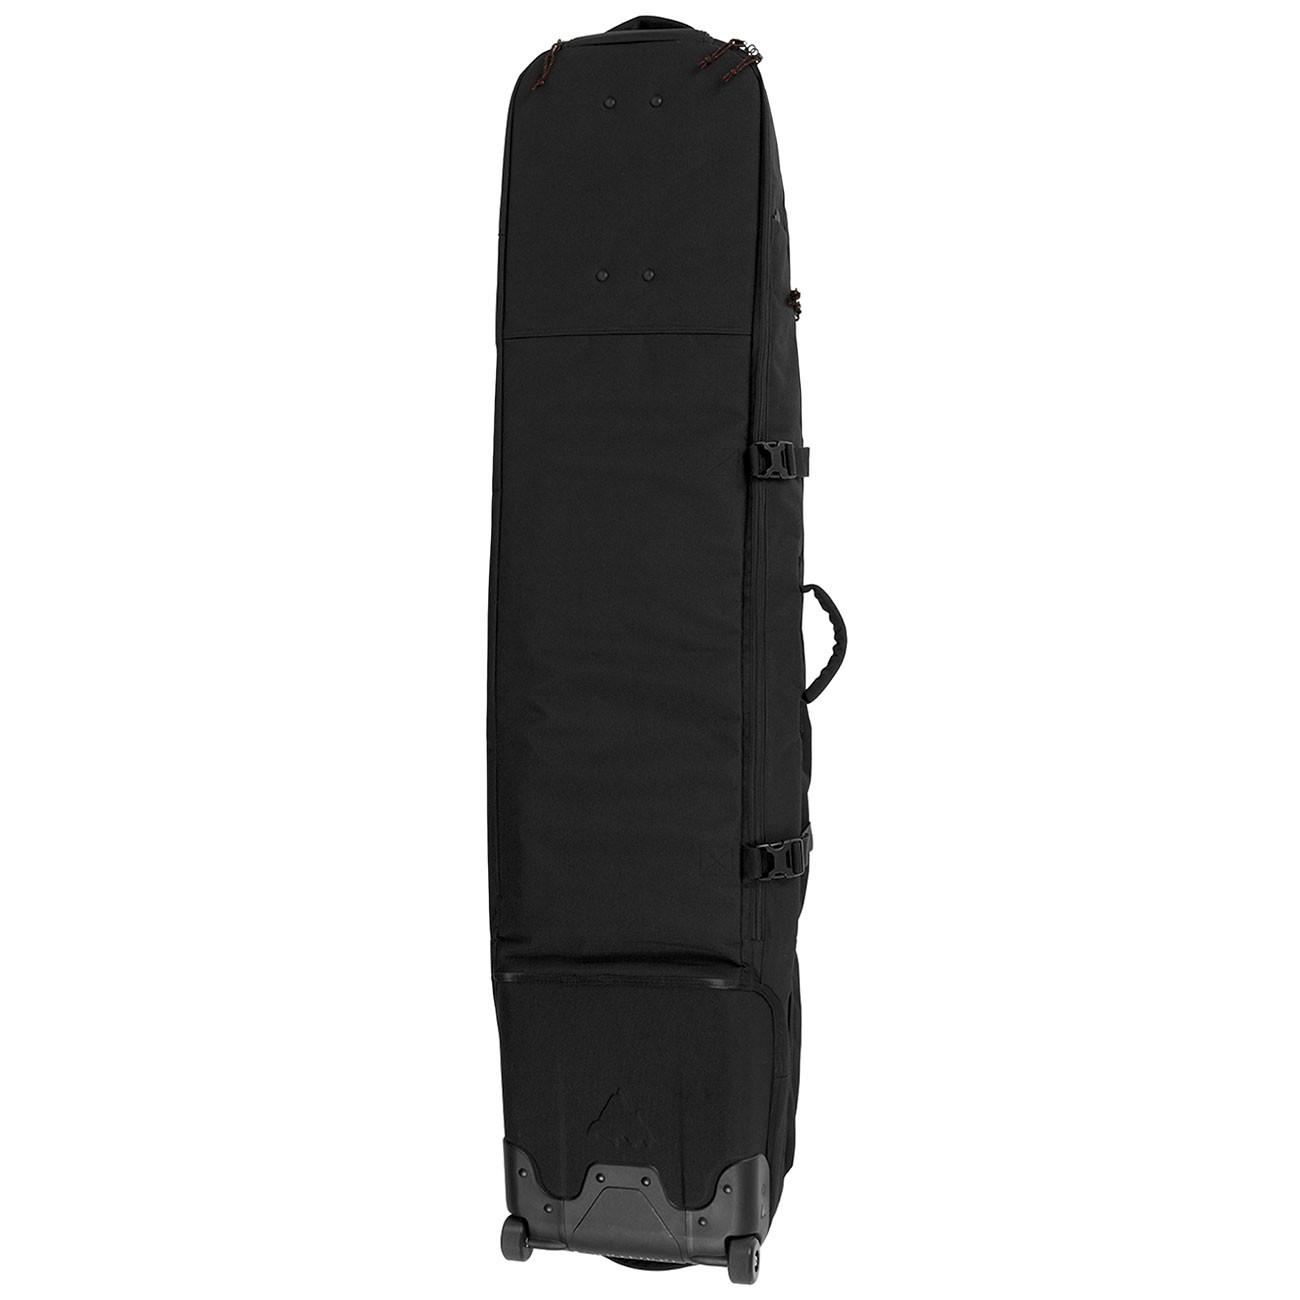 953eb3ba765 Obal na snowboard Burton Wheelie Gig Bag true black